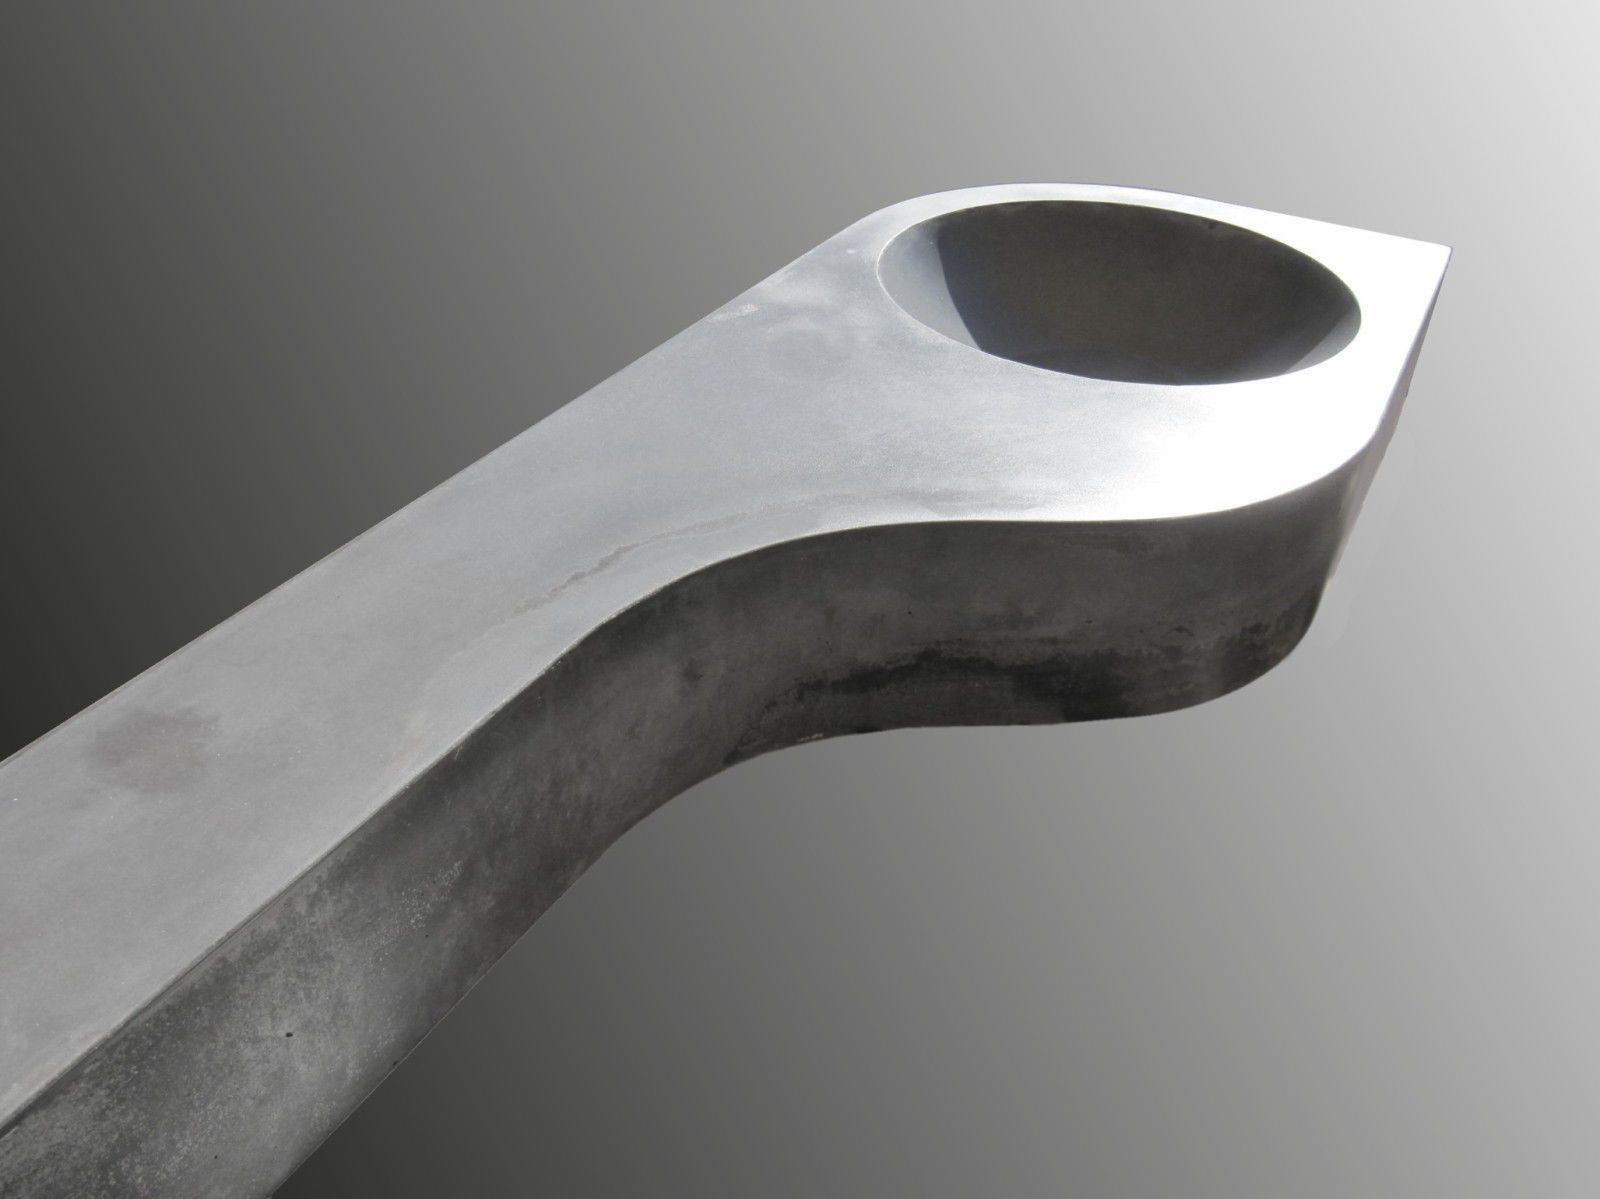 Plan vasque en béton bfuhp Ductal® - CIRCULAIRE - BALIAN BETON Atelier